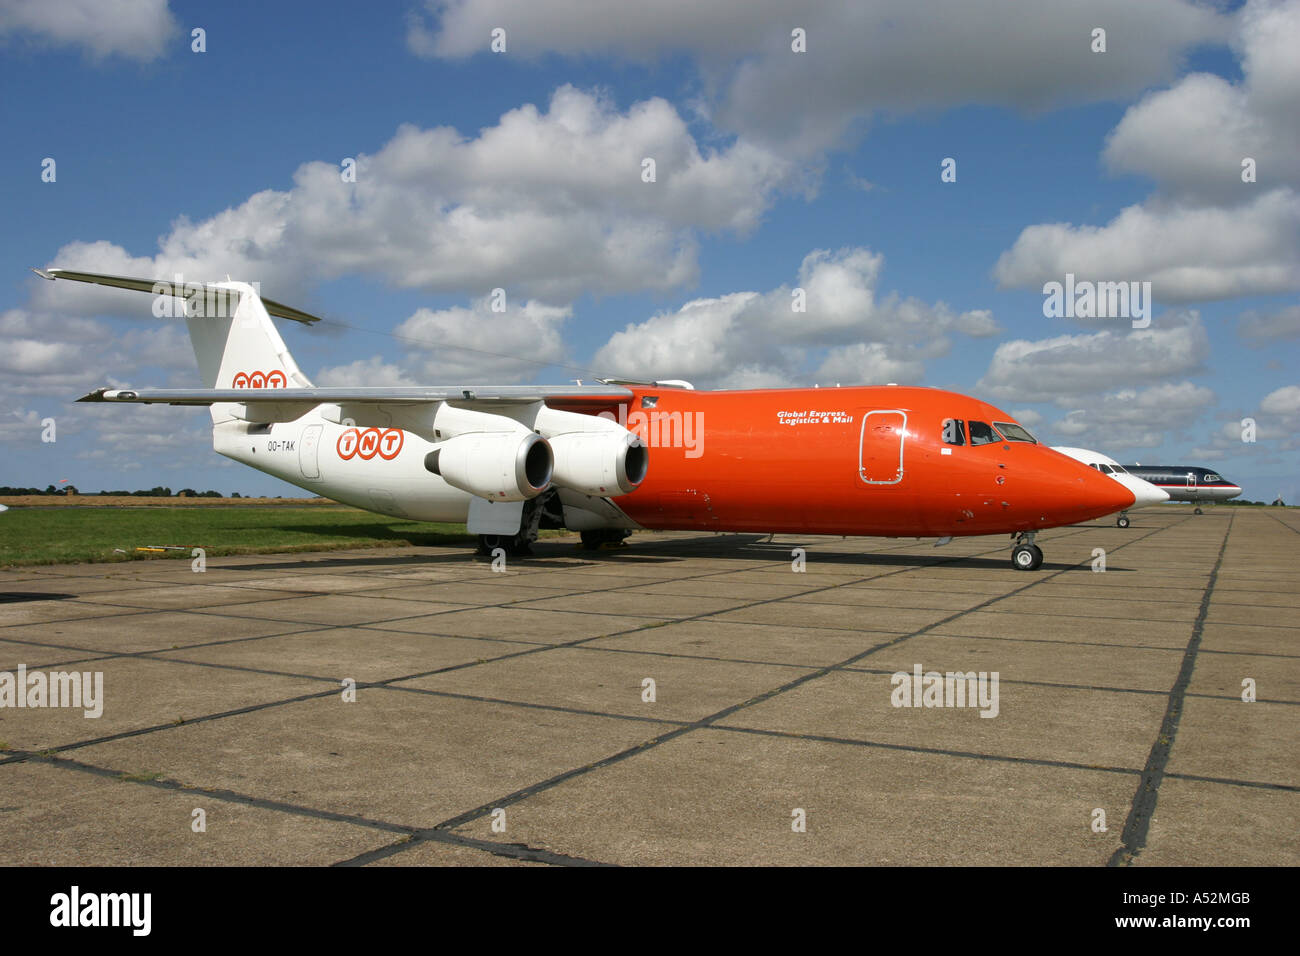 British Aerospace Bae 146 freighter aircraft - Stock Image